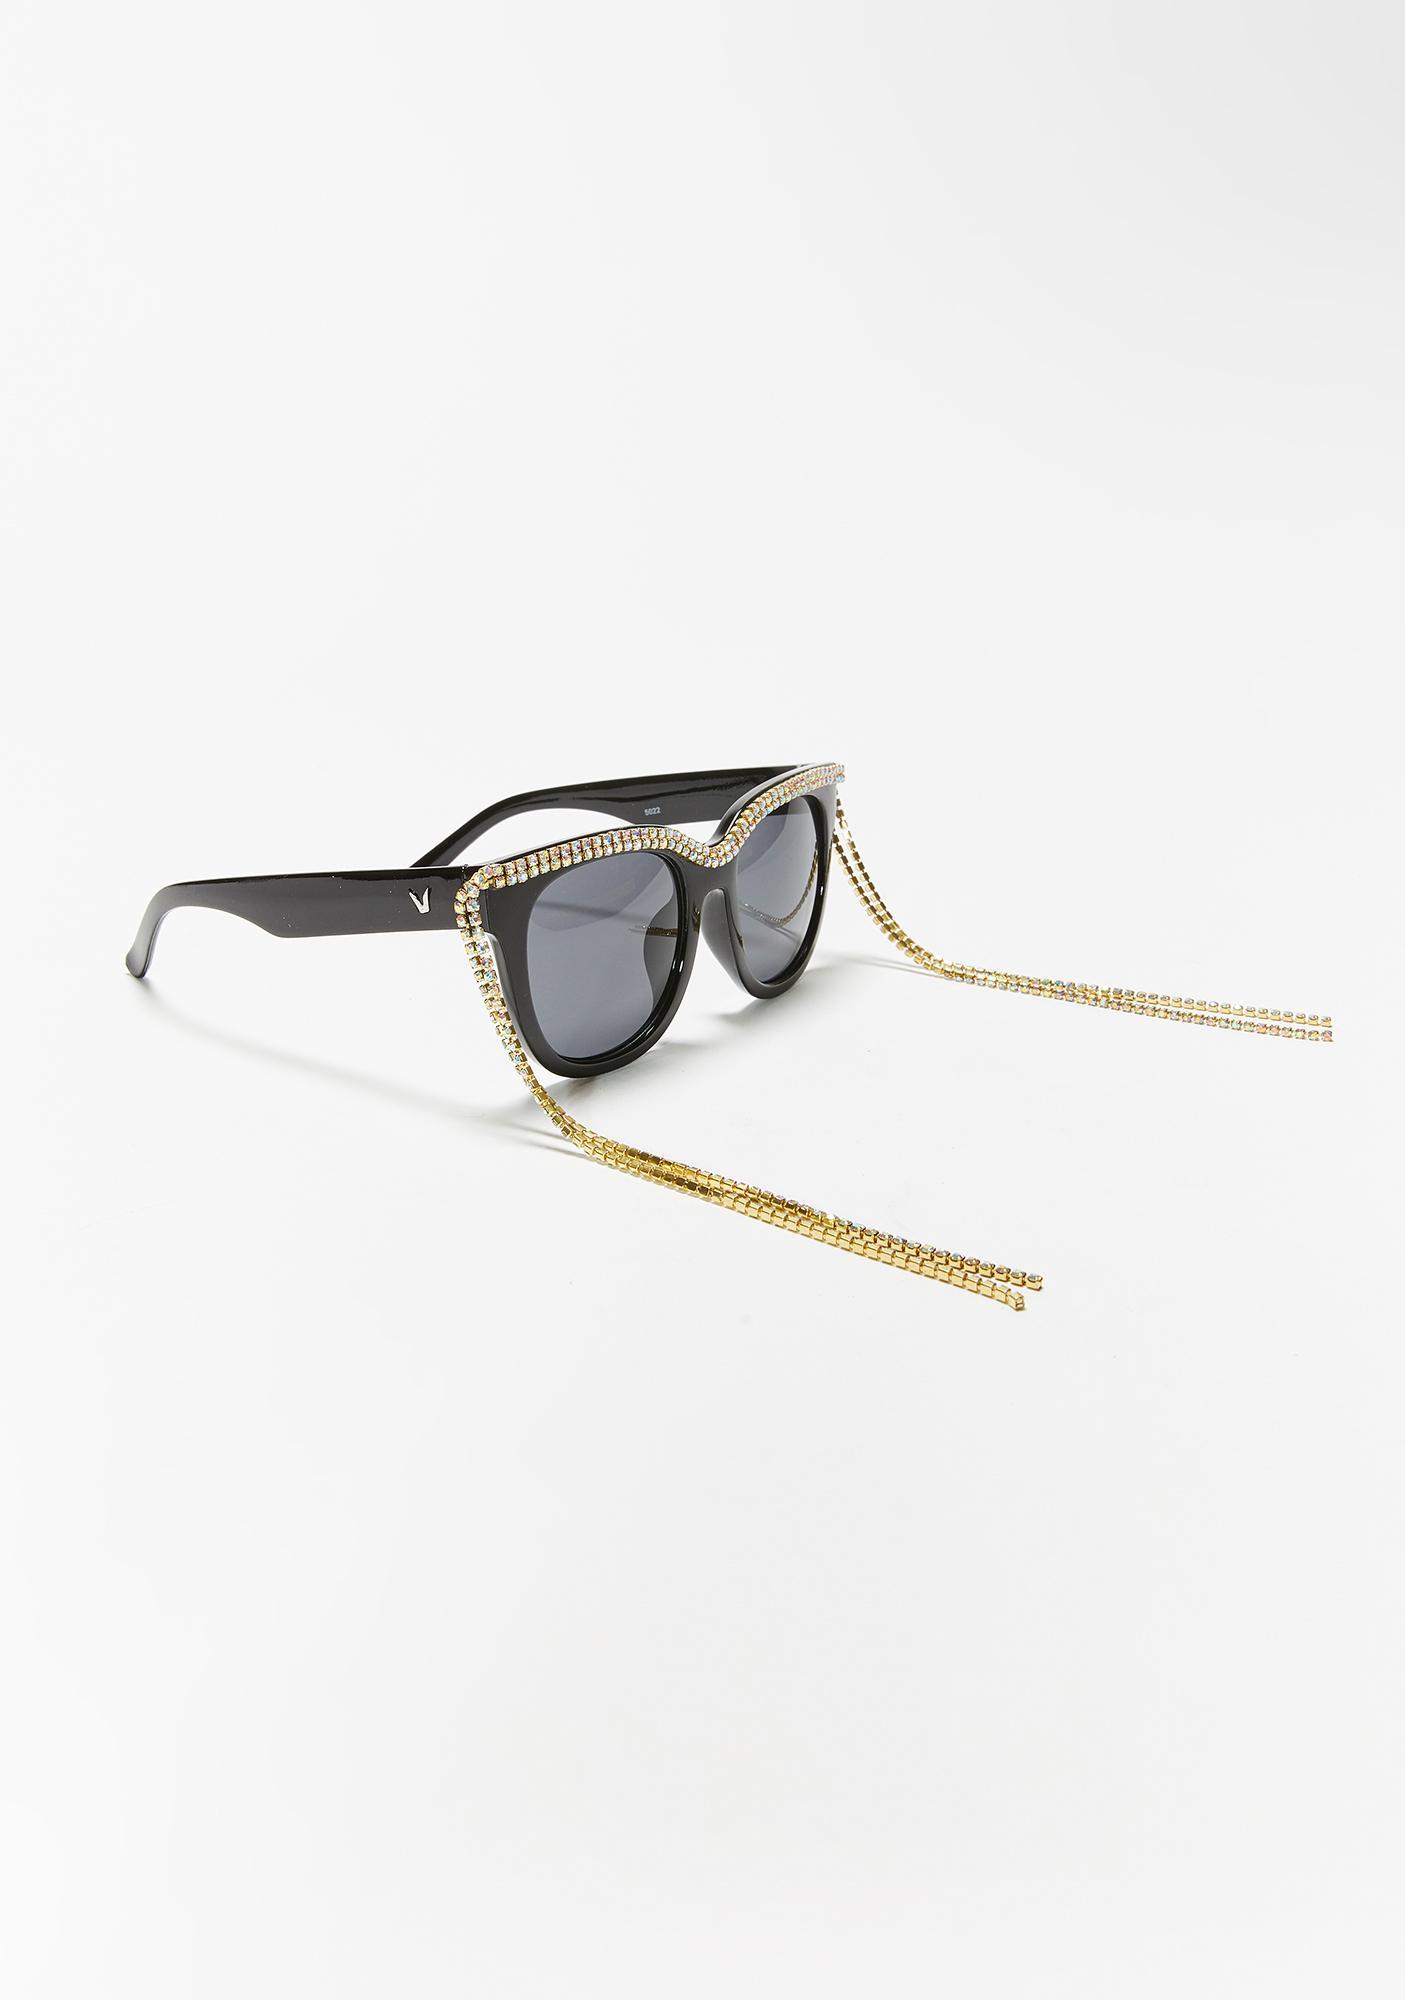 Slide Thru Rhinestone Sunglasses